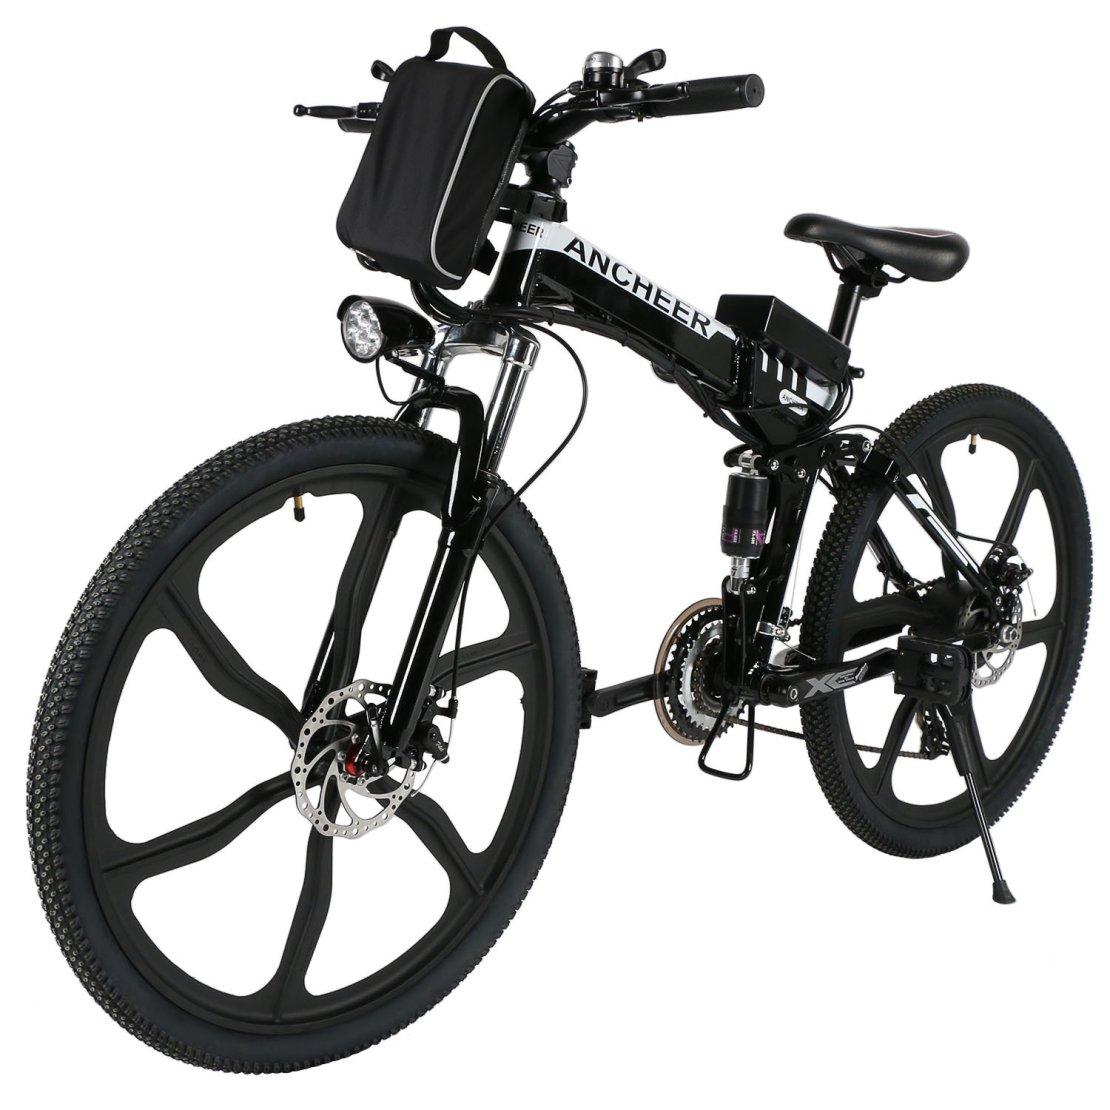 71dcLLPi1KL. SL1500  - 10 Best Electric Bikes 2019